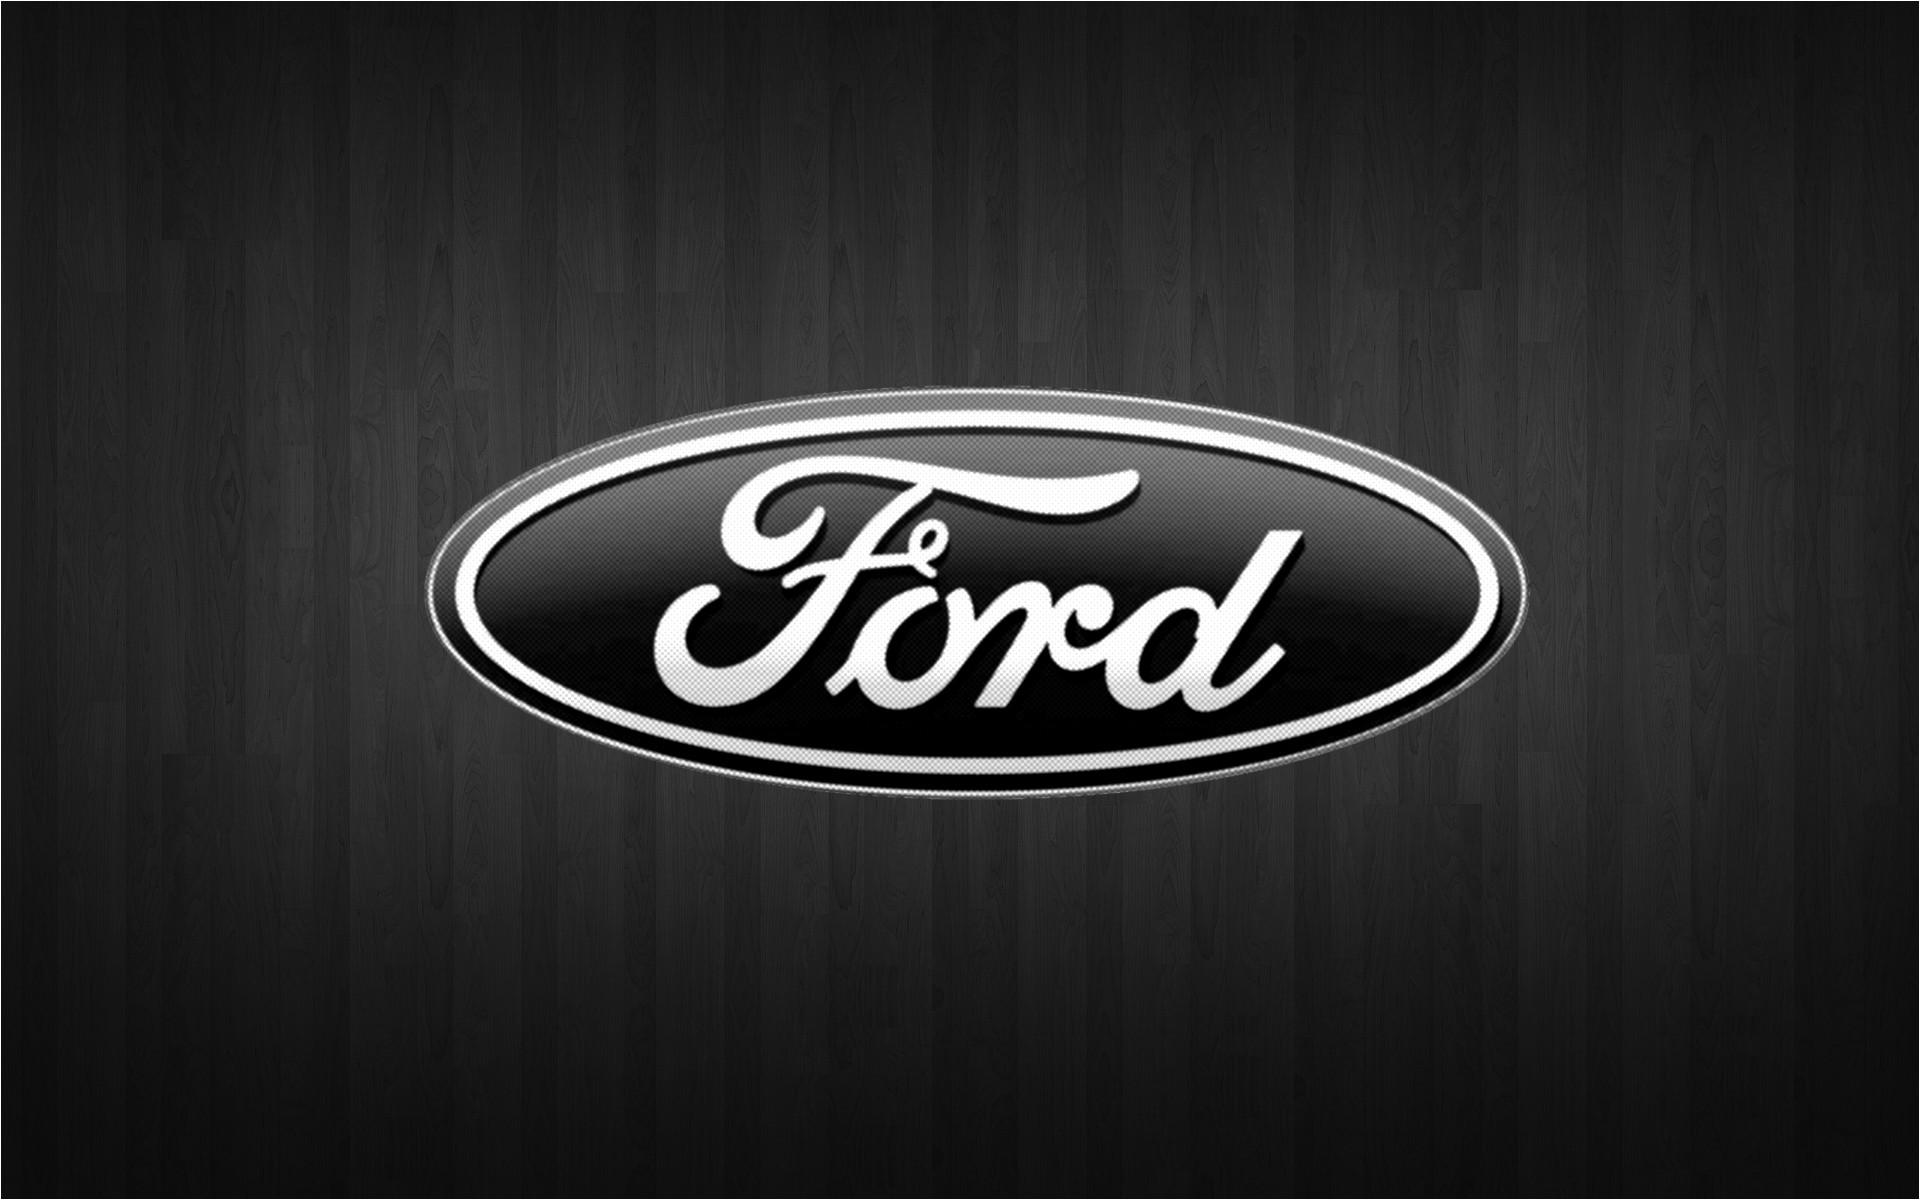 1280x1280 Car Wallpaper Ford Mustang Logo Wallpaper 183 ①